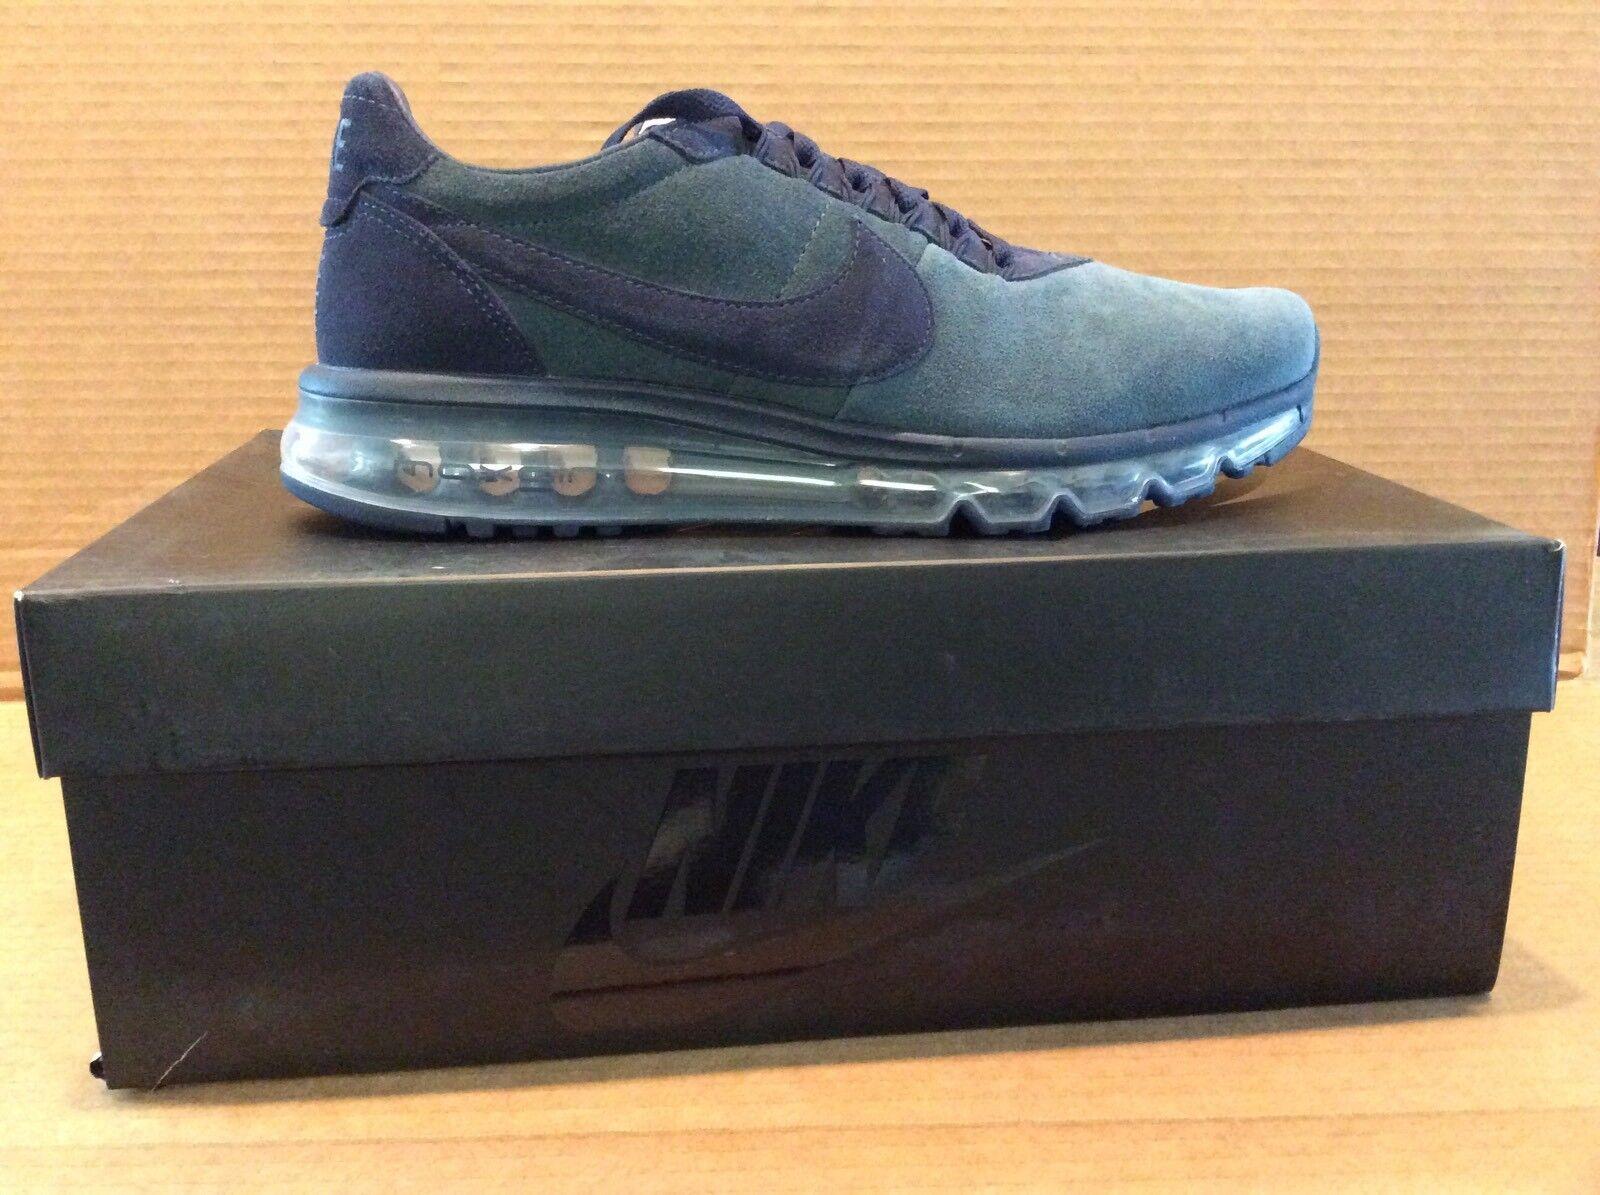 Nike Air Max LD-Zero size 10.5 black/black-black-dark grey